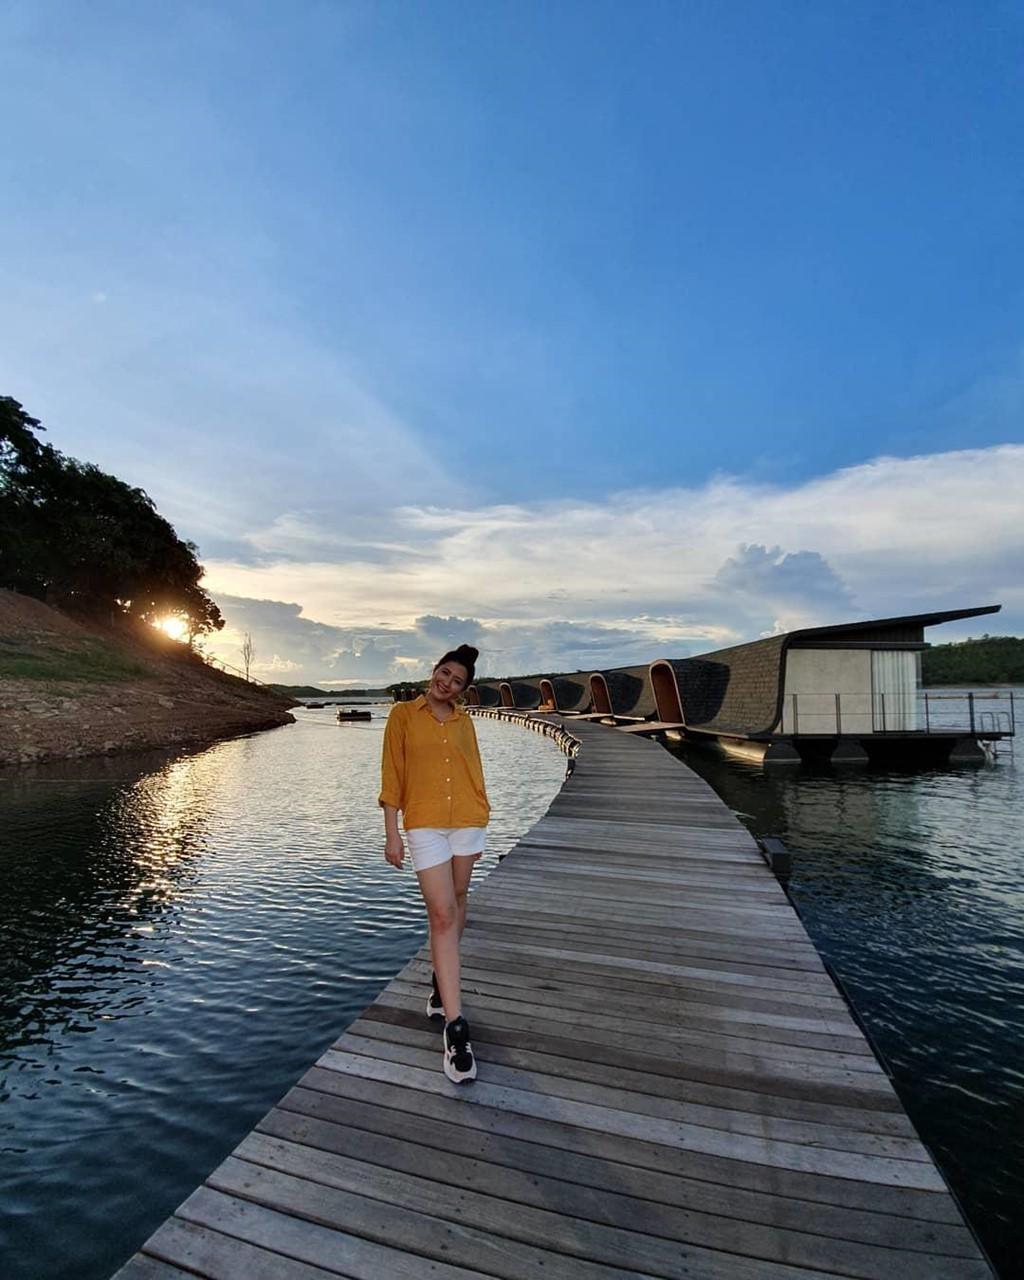 Tuyet tac resort noi tren mat nuoc hut khach check-in tai Bangkok hinh anh 6